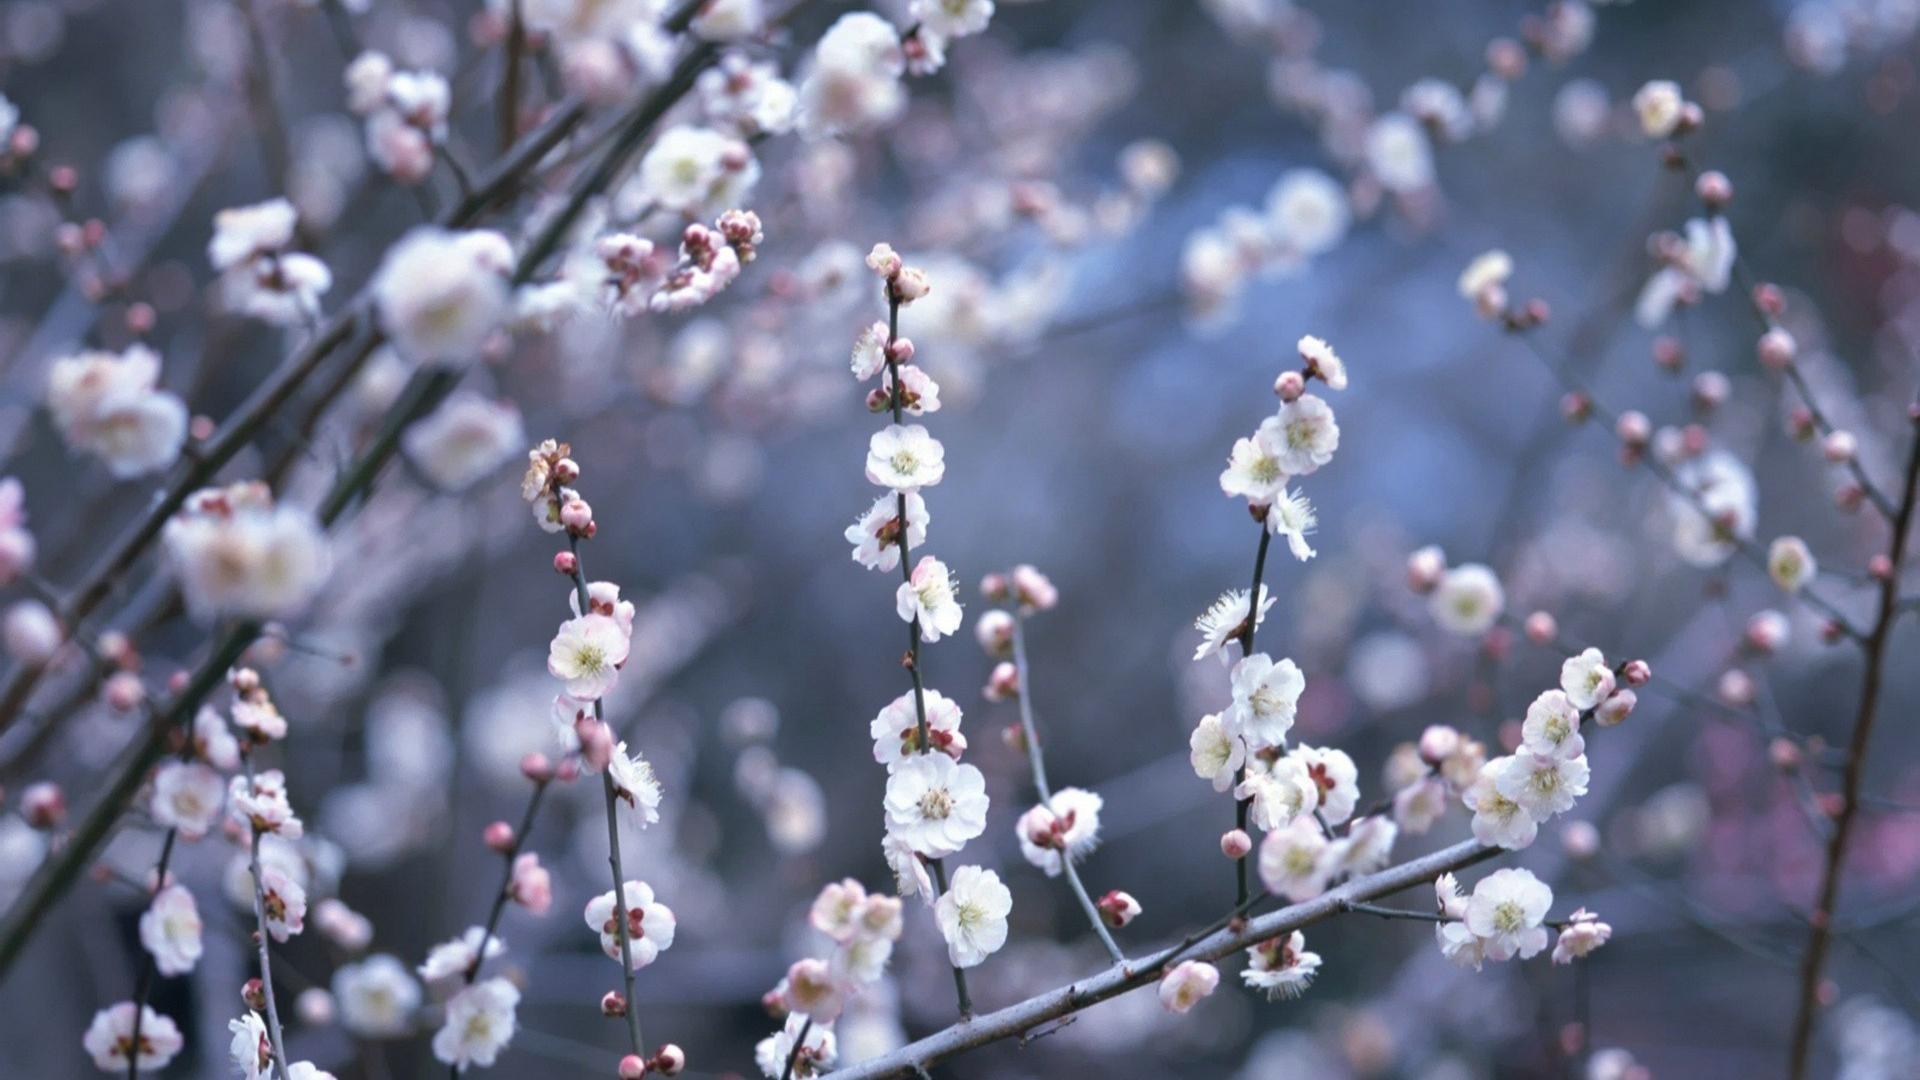 Japan cherry blossoms flowers spring (season) wallpaper